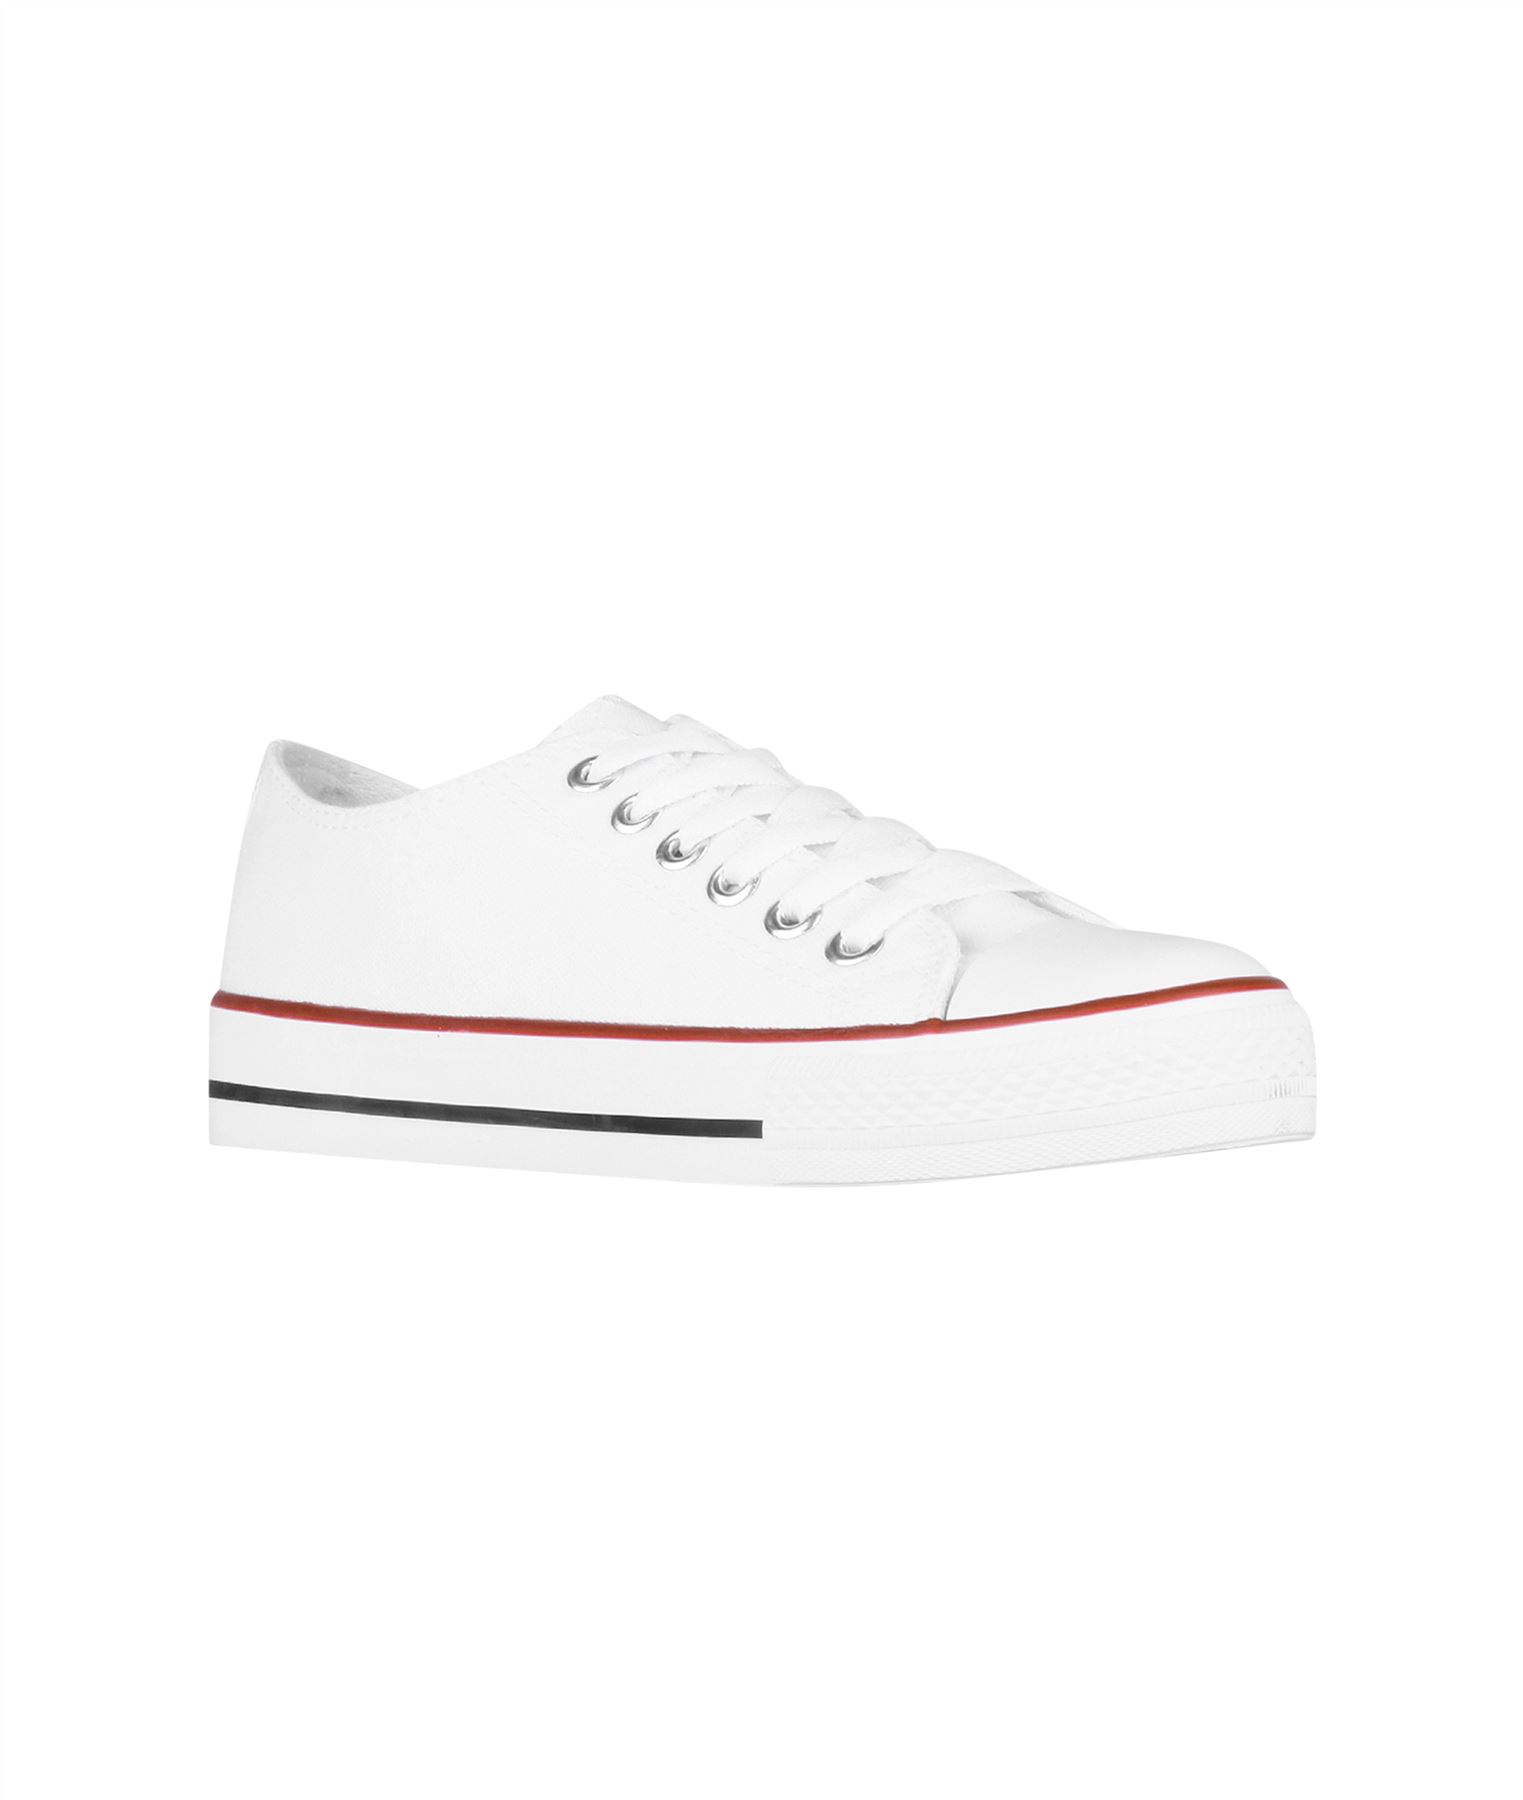 Zapatillas-Mujer-Casuales-Deportiva-Barata-Lona-Moda-Originales-Outlet-Tela-Moda miniatura 8